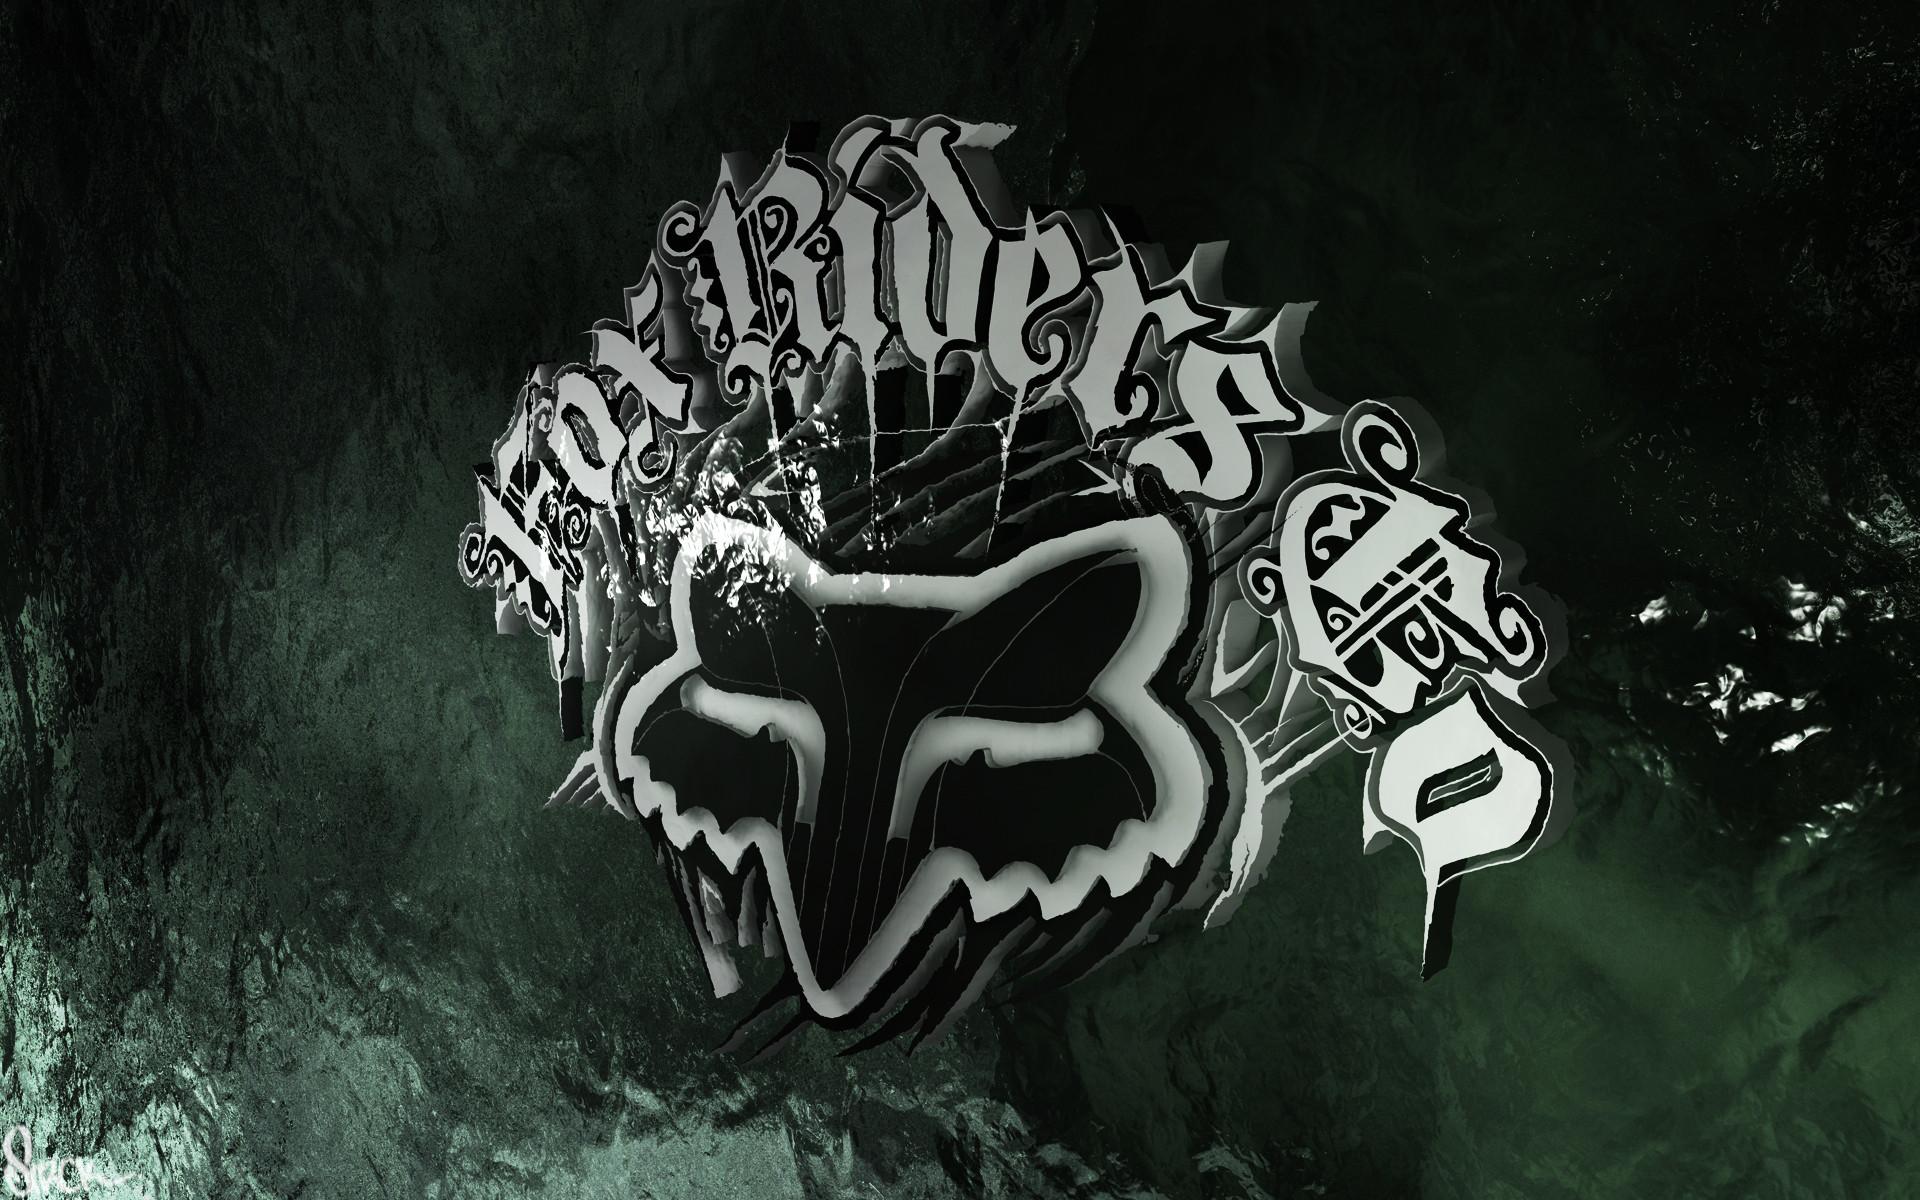 Fox Racing Backgrounds – Wallpaper Cave